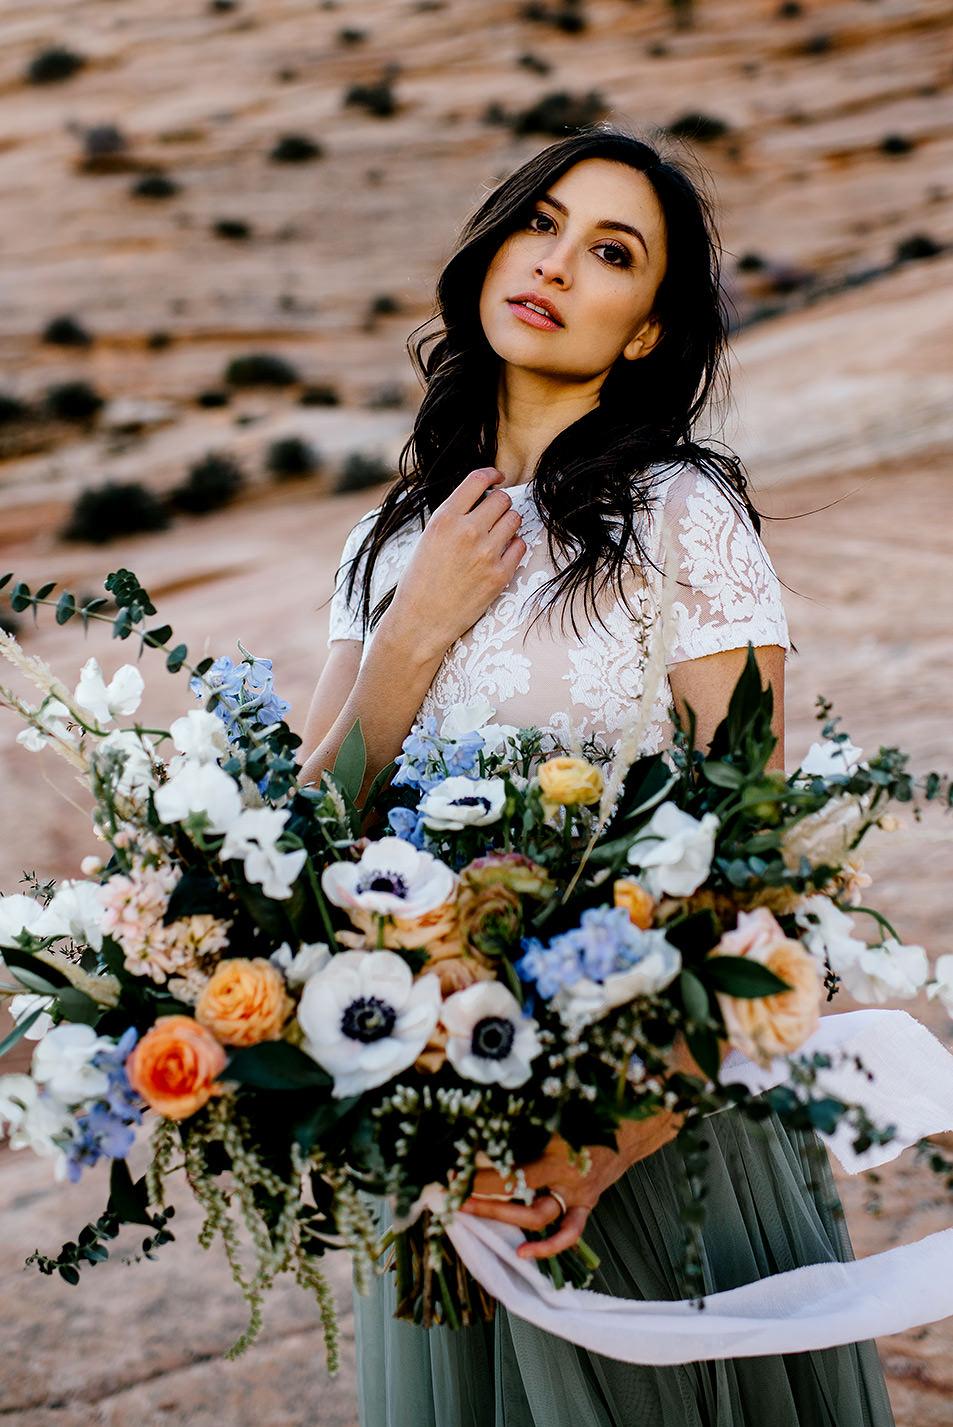 Zion_National_Park_Arizona_Wedding_Photographer_002.jpg